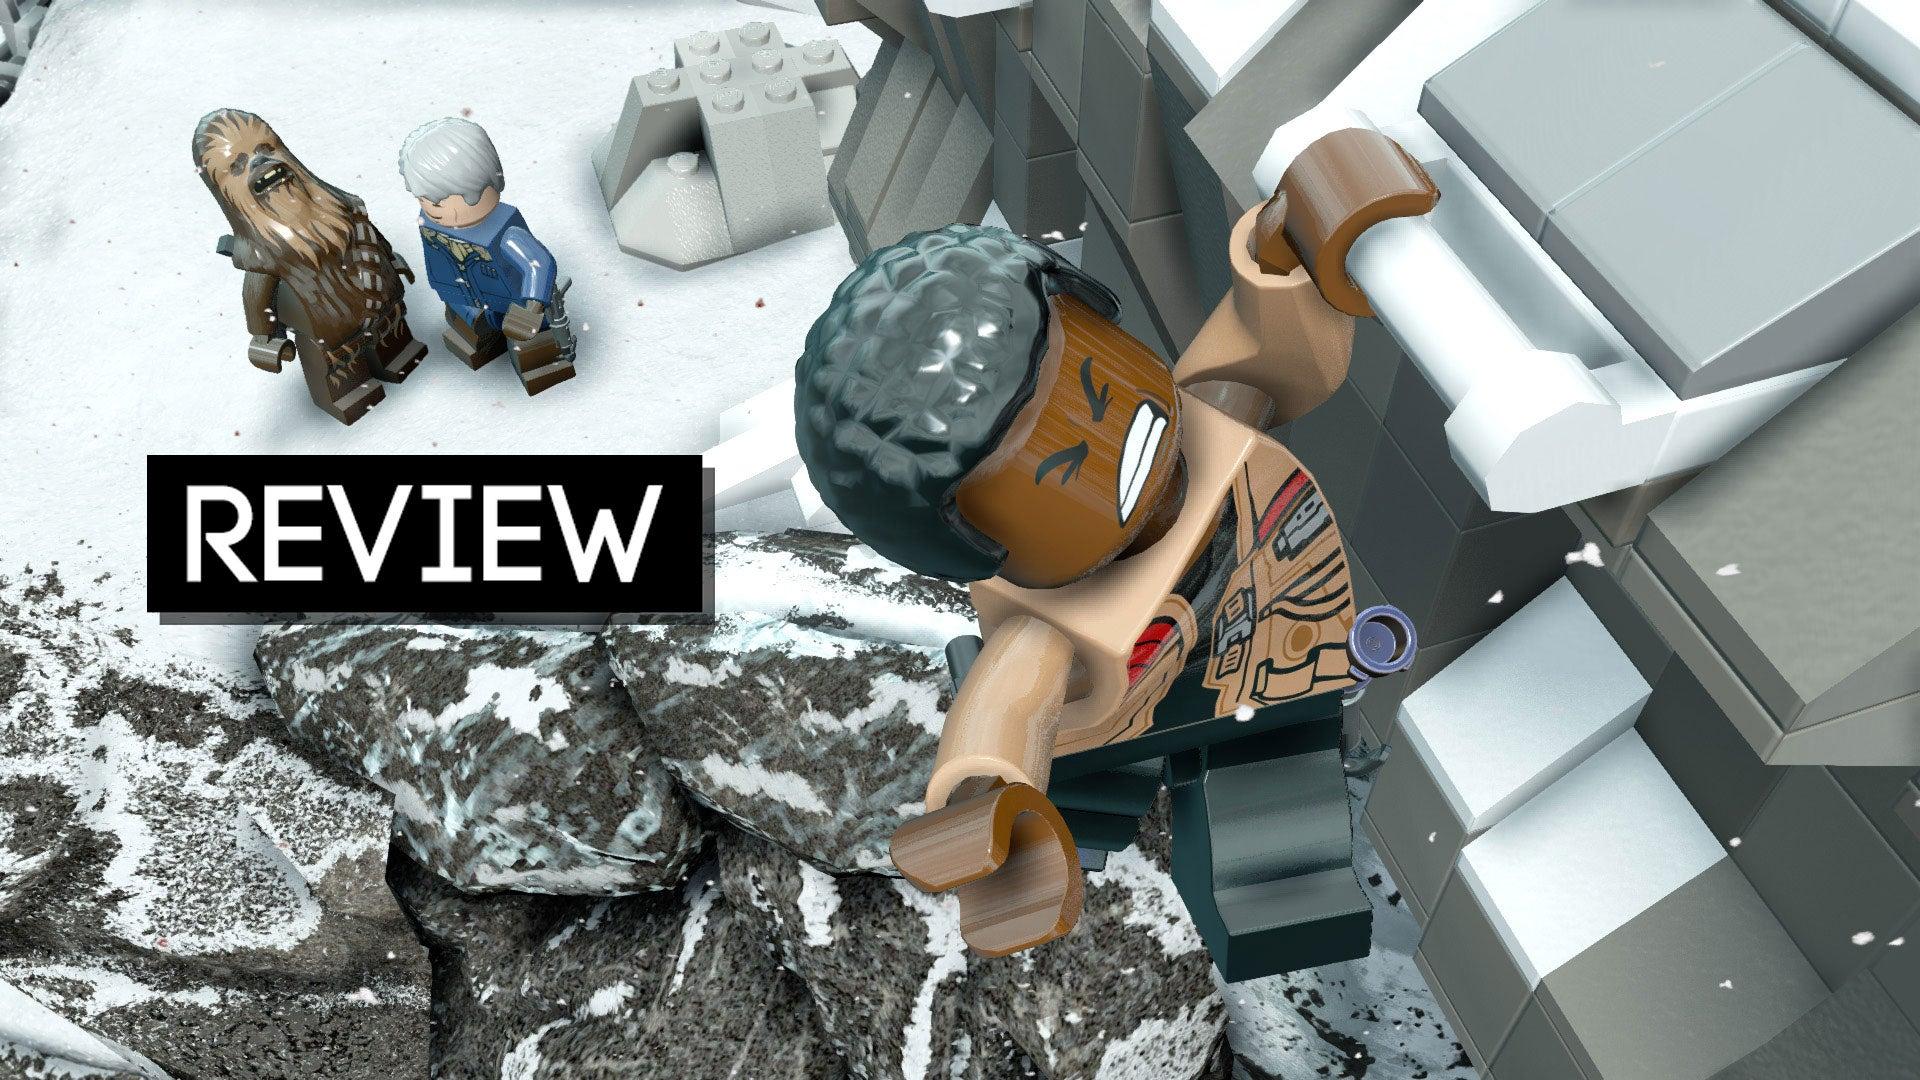 LEGO Star Wars: The Force Awakens: The Kotaku Review